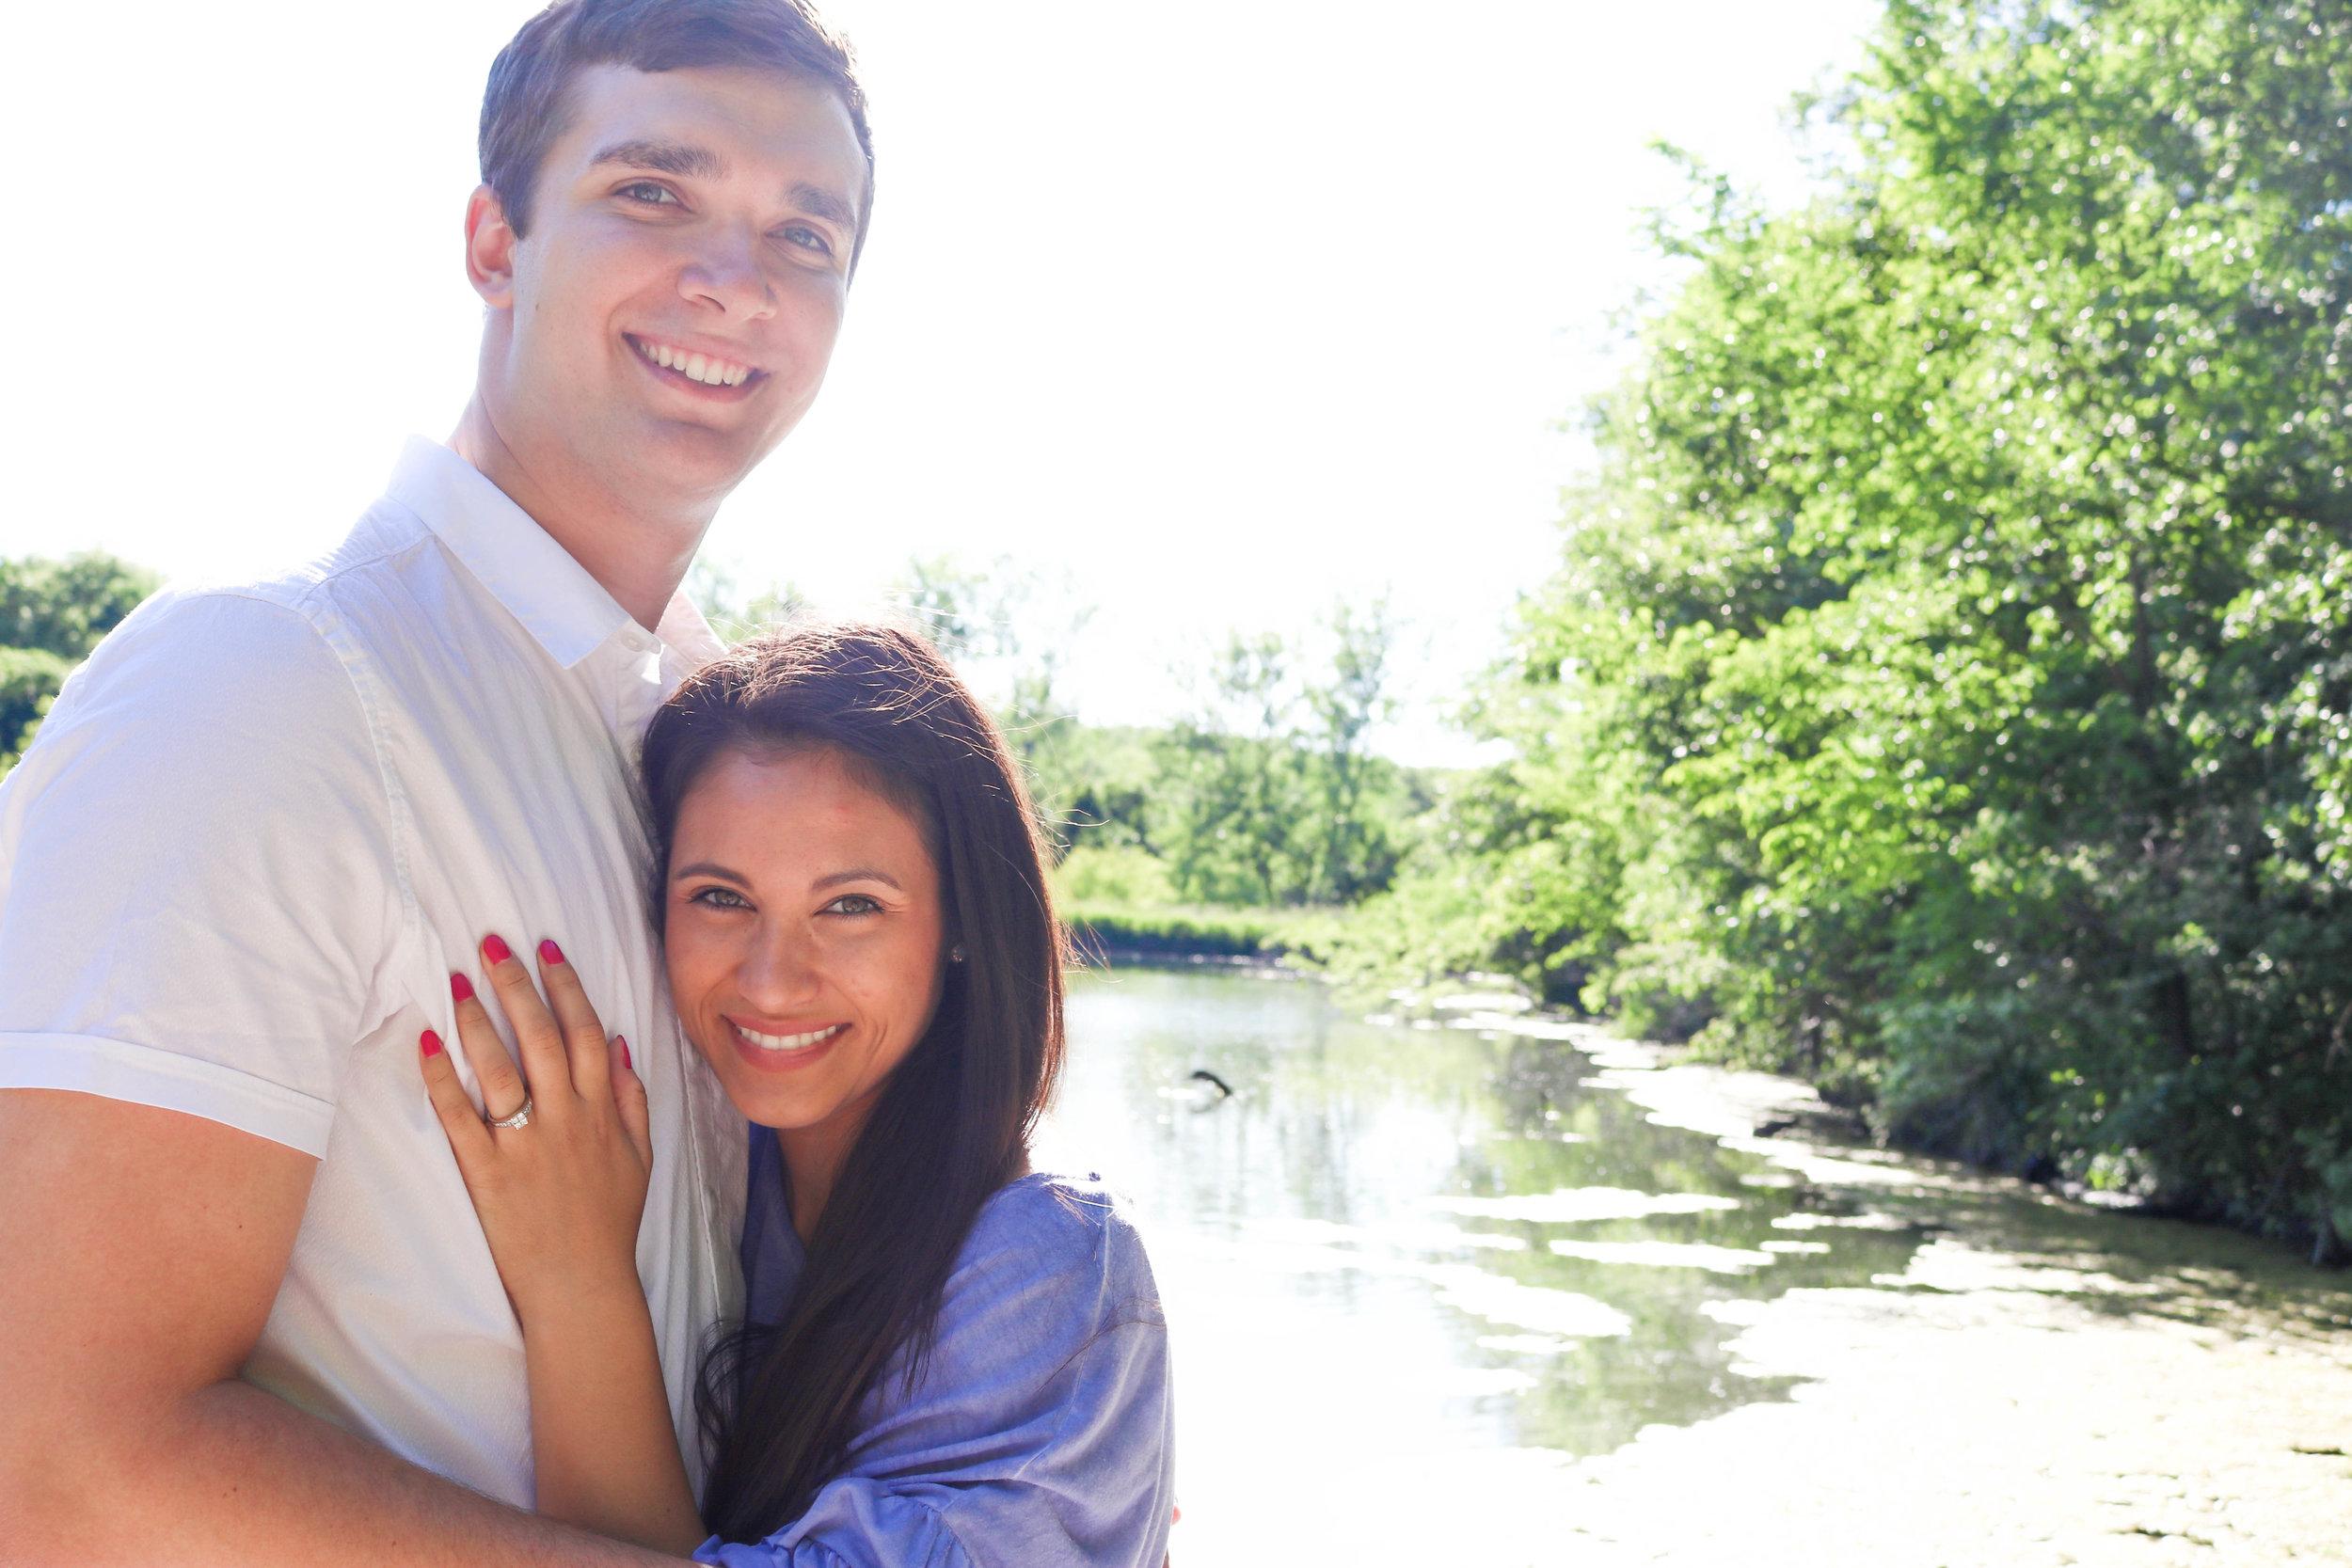 Brianna + Michael | Summer 2018 | Carolina Crossing | Engagement Session